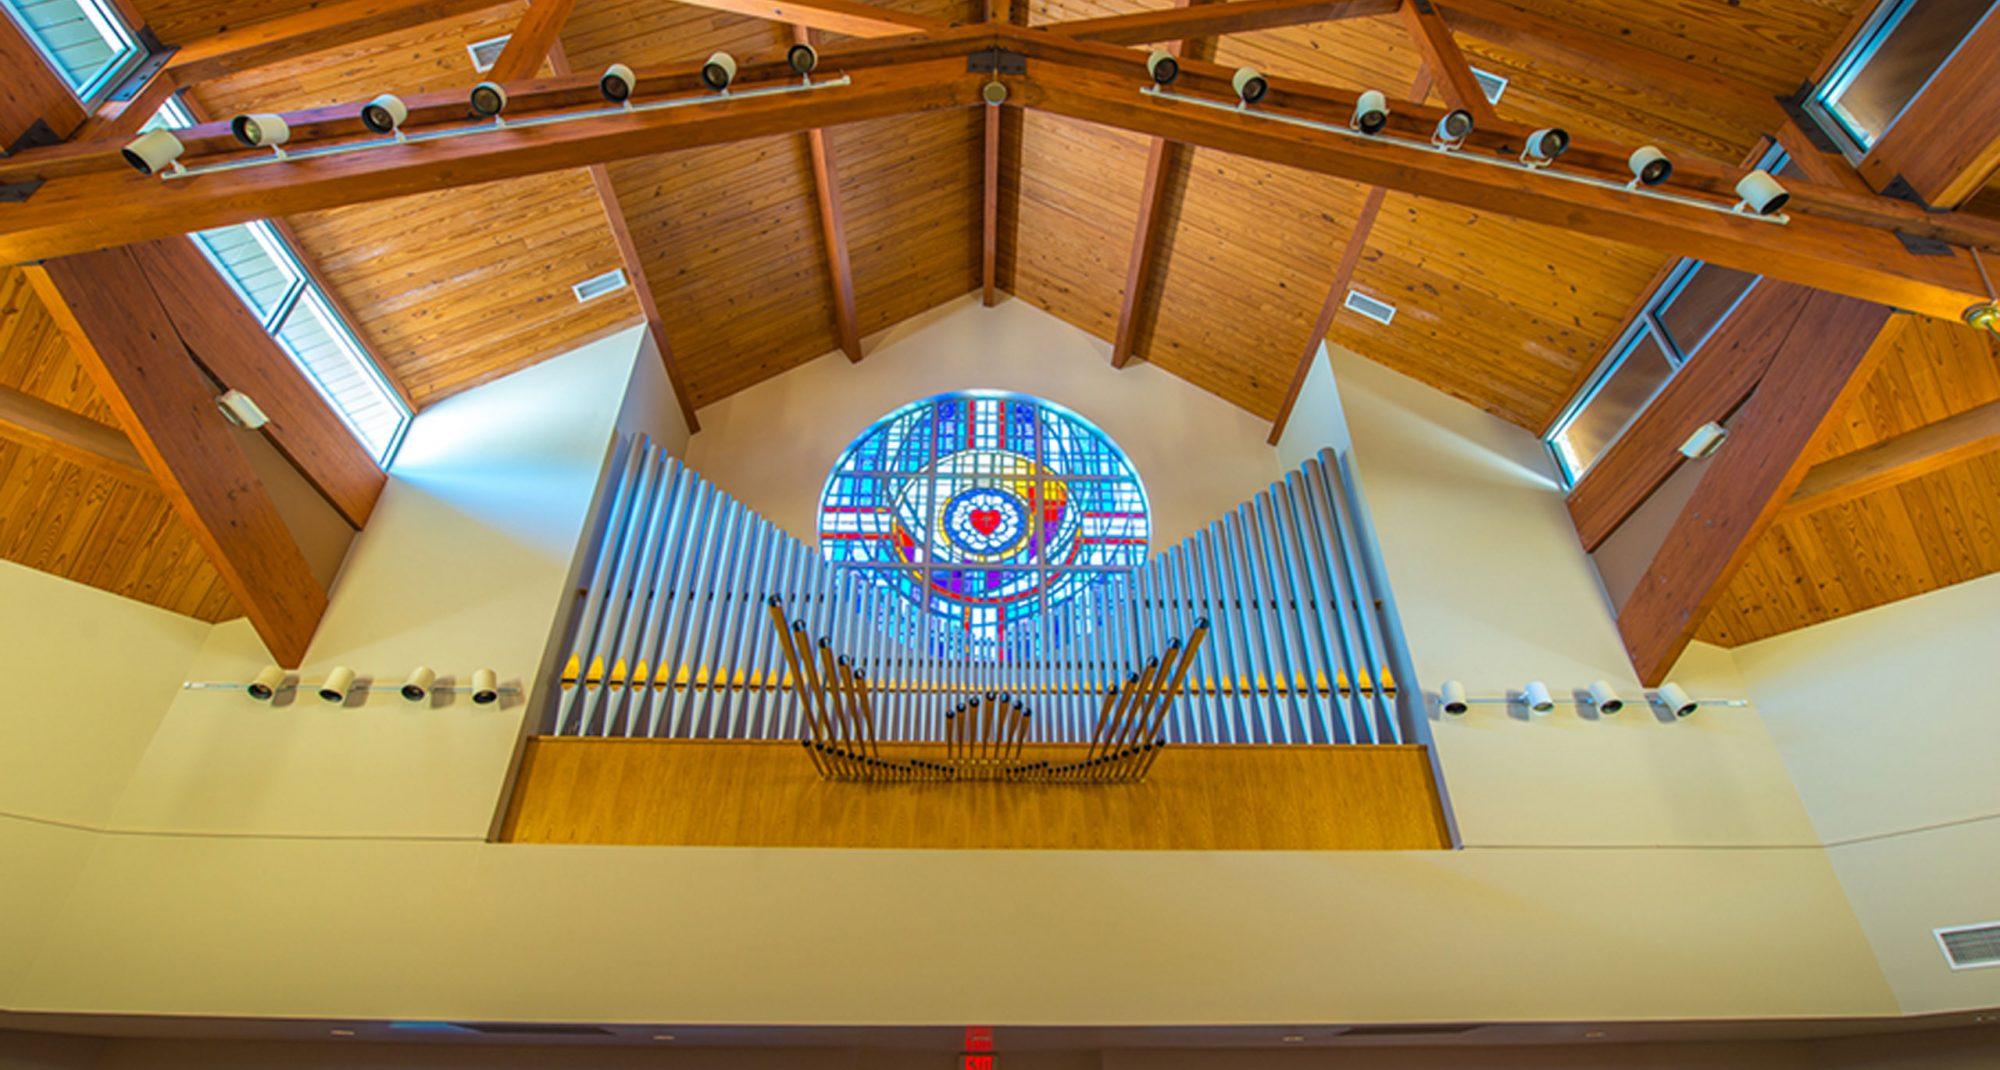 St Armands Key Lutheran Church